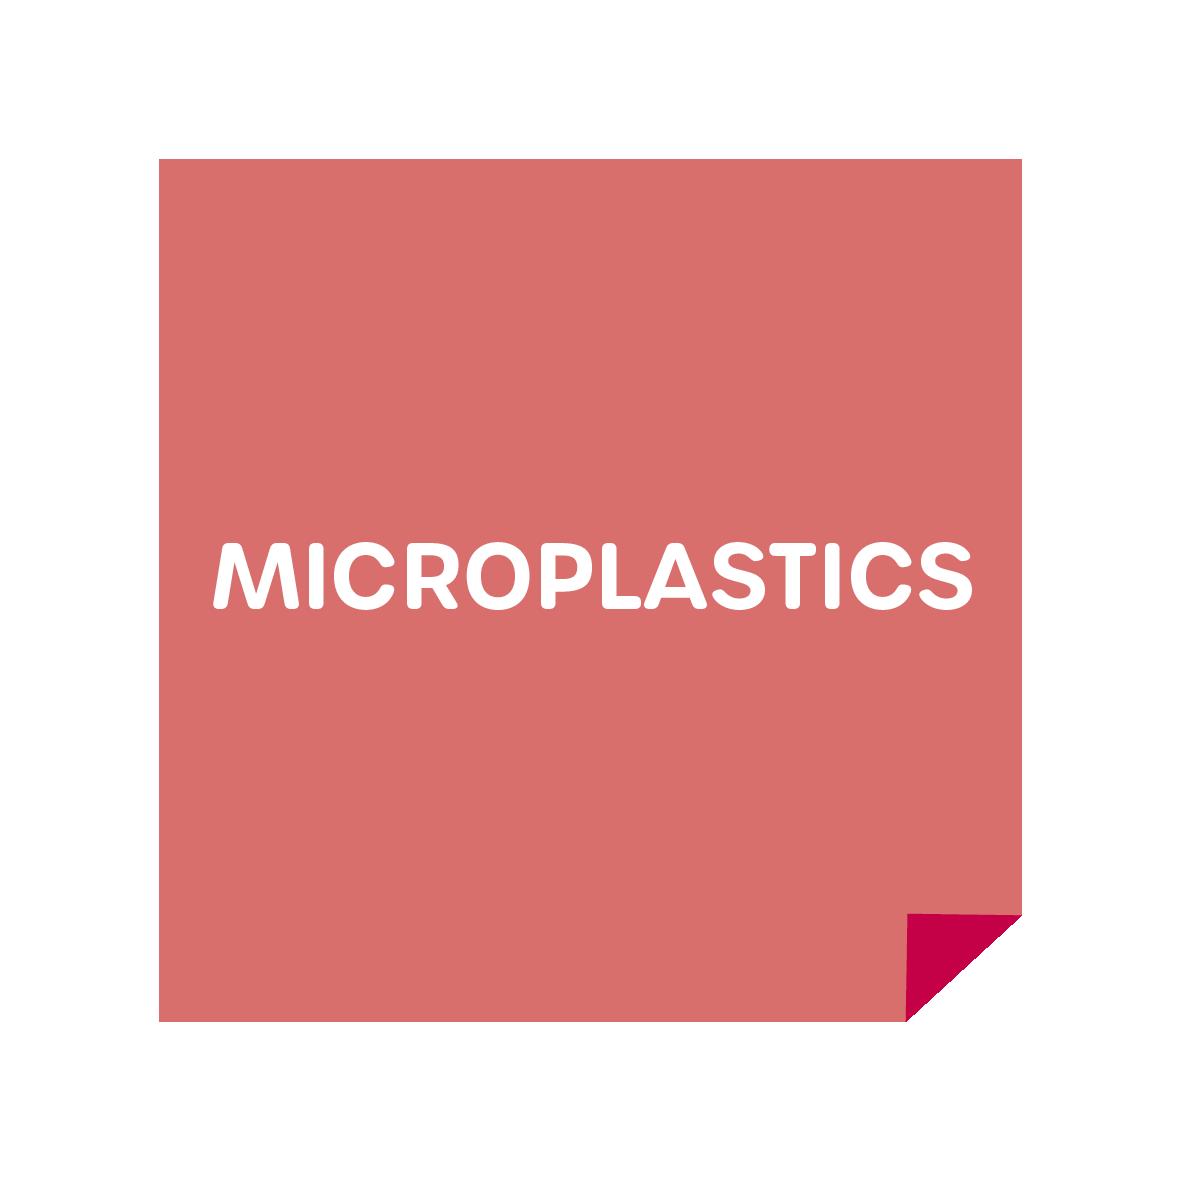 Microplastics Definition